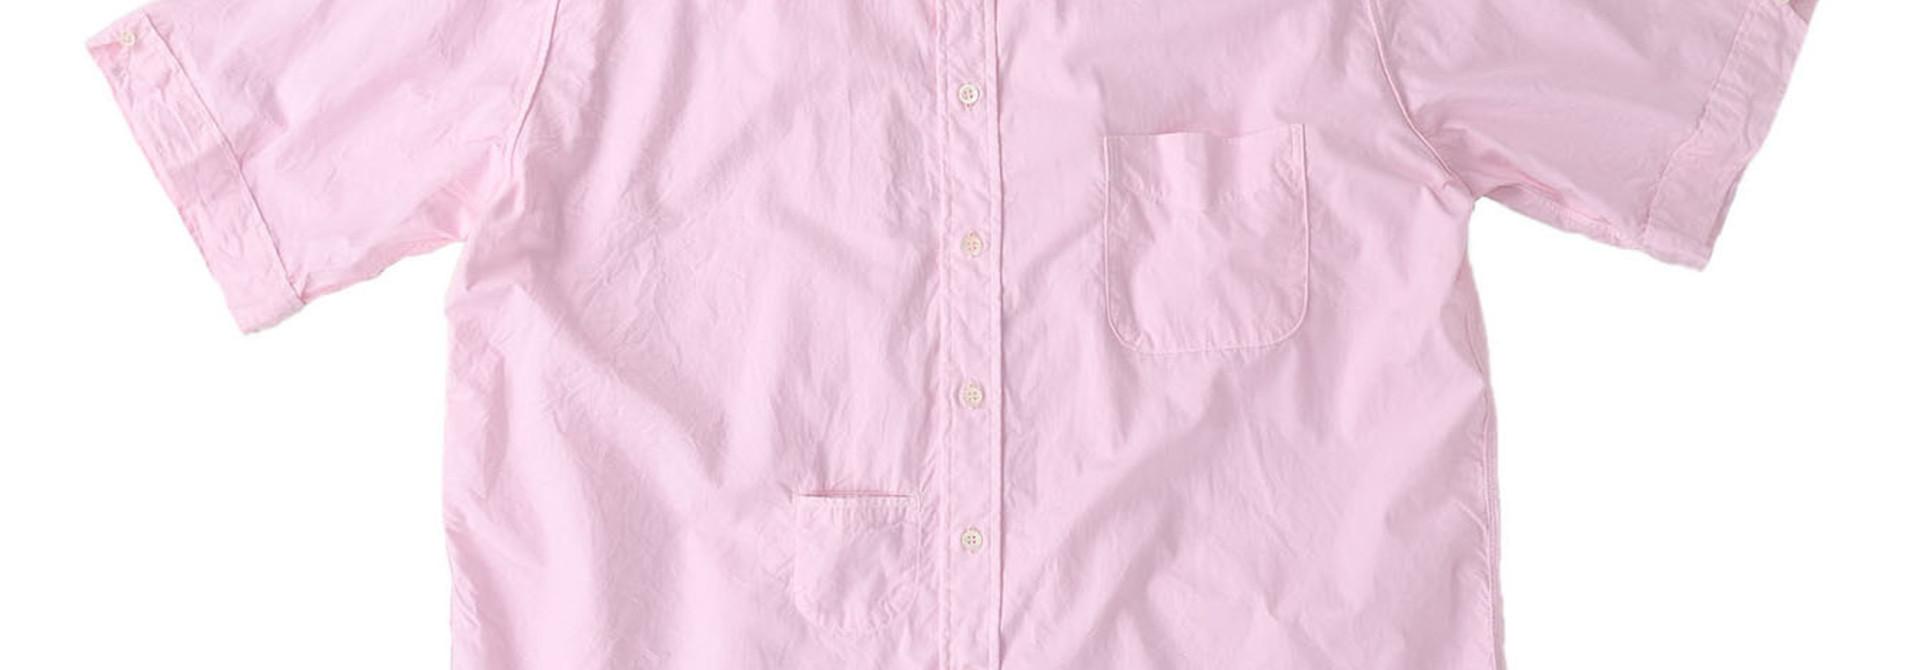 Damp Cotton Anuenue Ocean Shirt (0621)